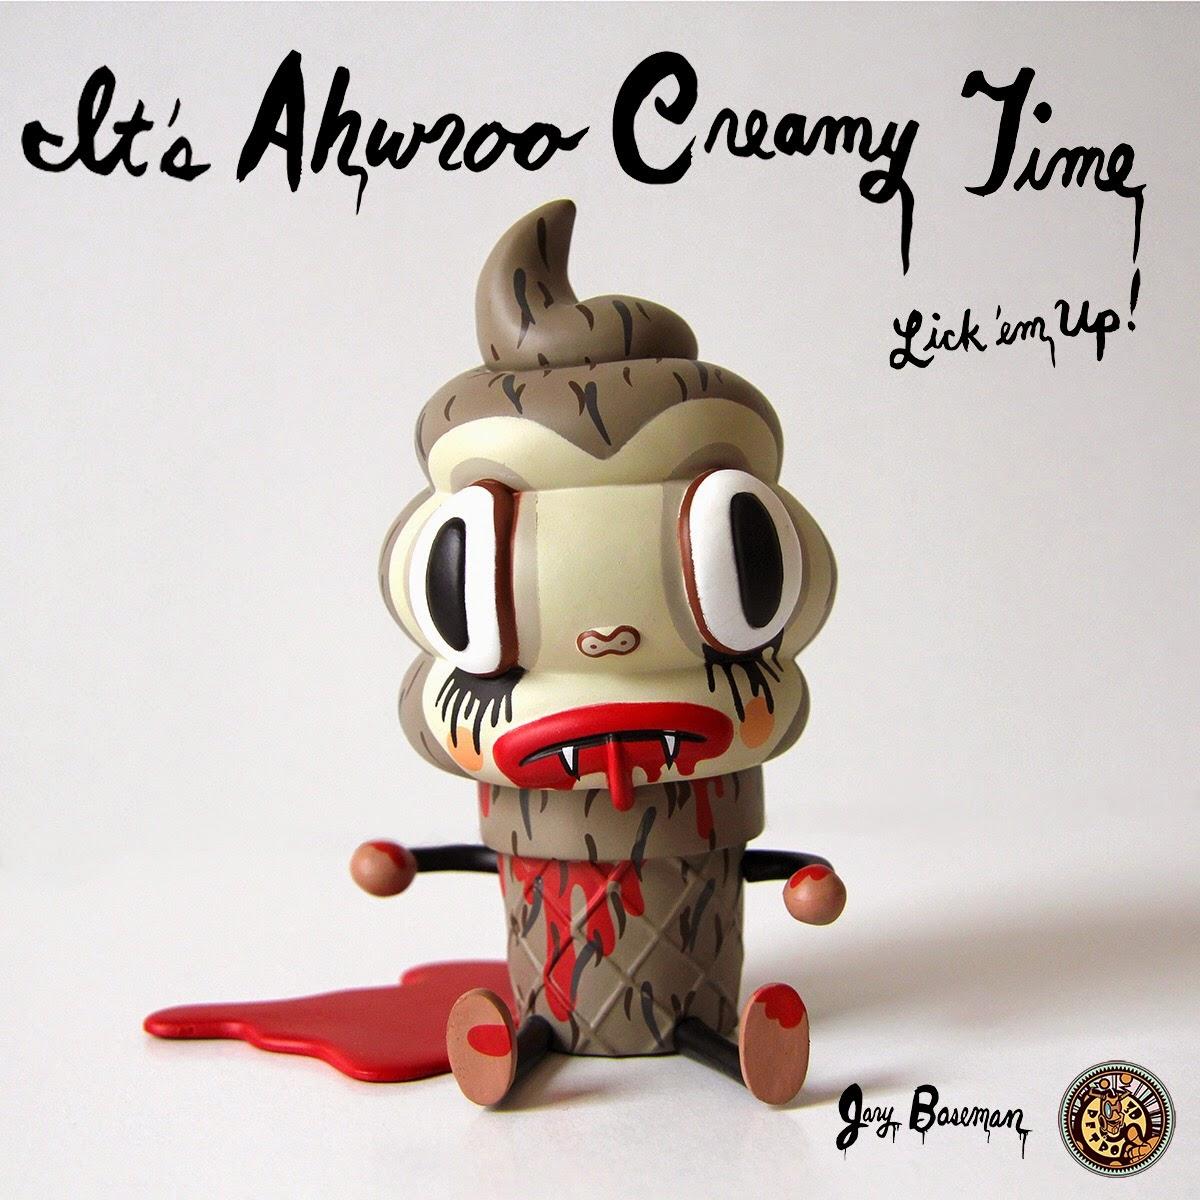 Ahwroo Edition Creamy Vinyl Figure by Gary Baseman